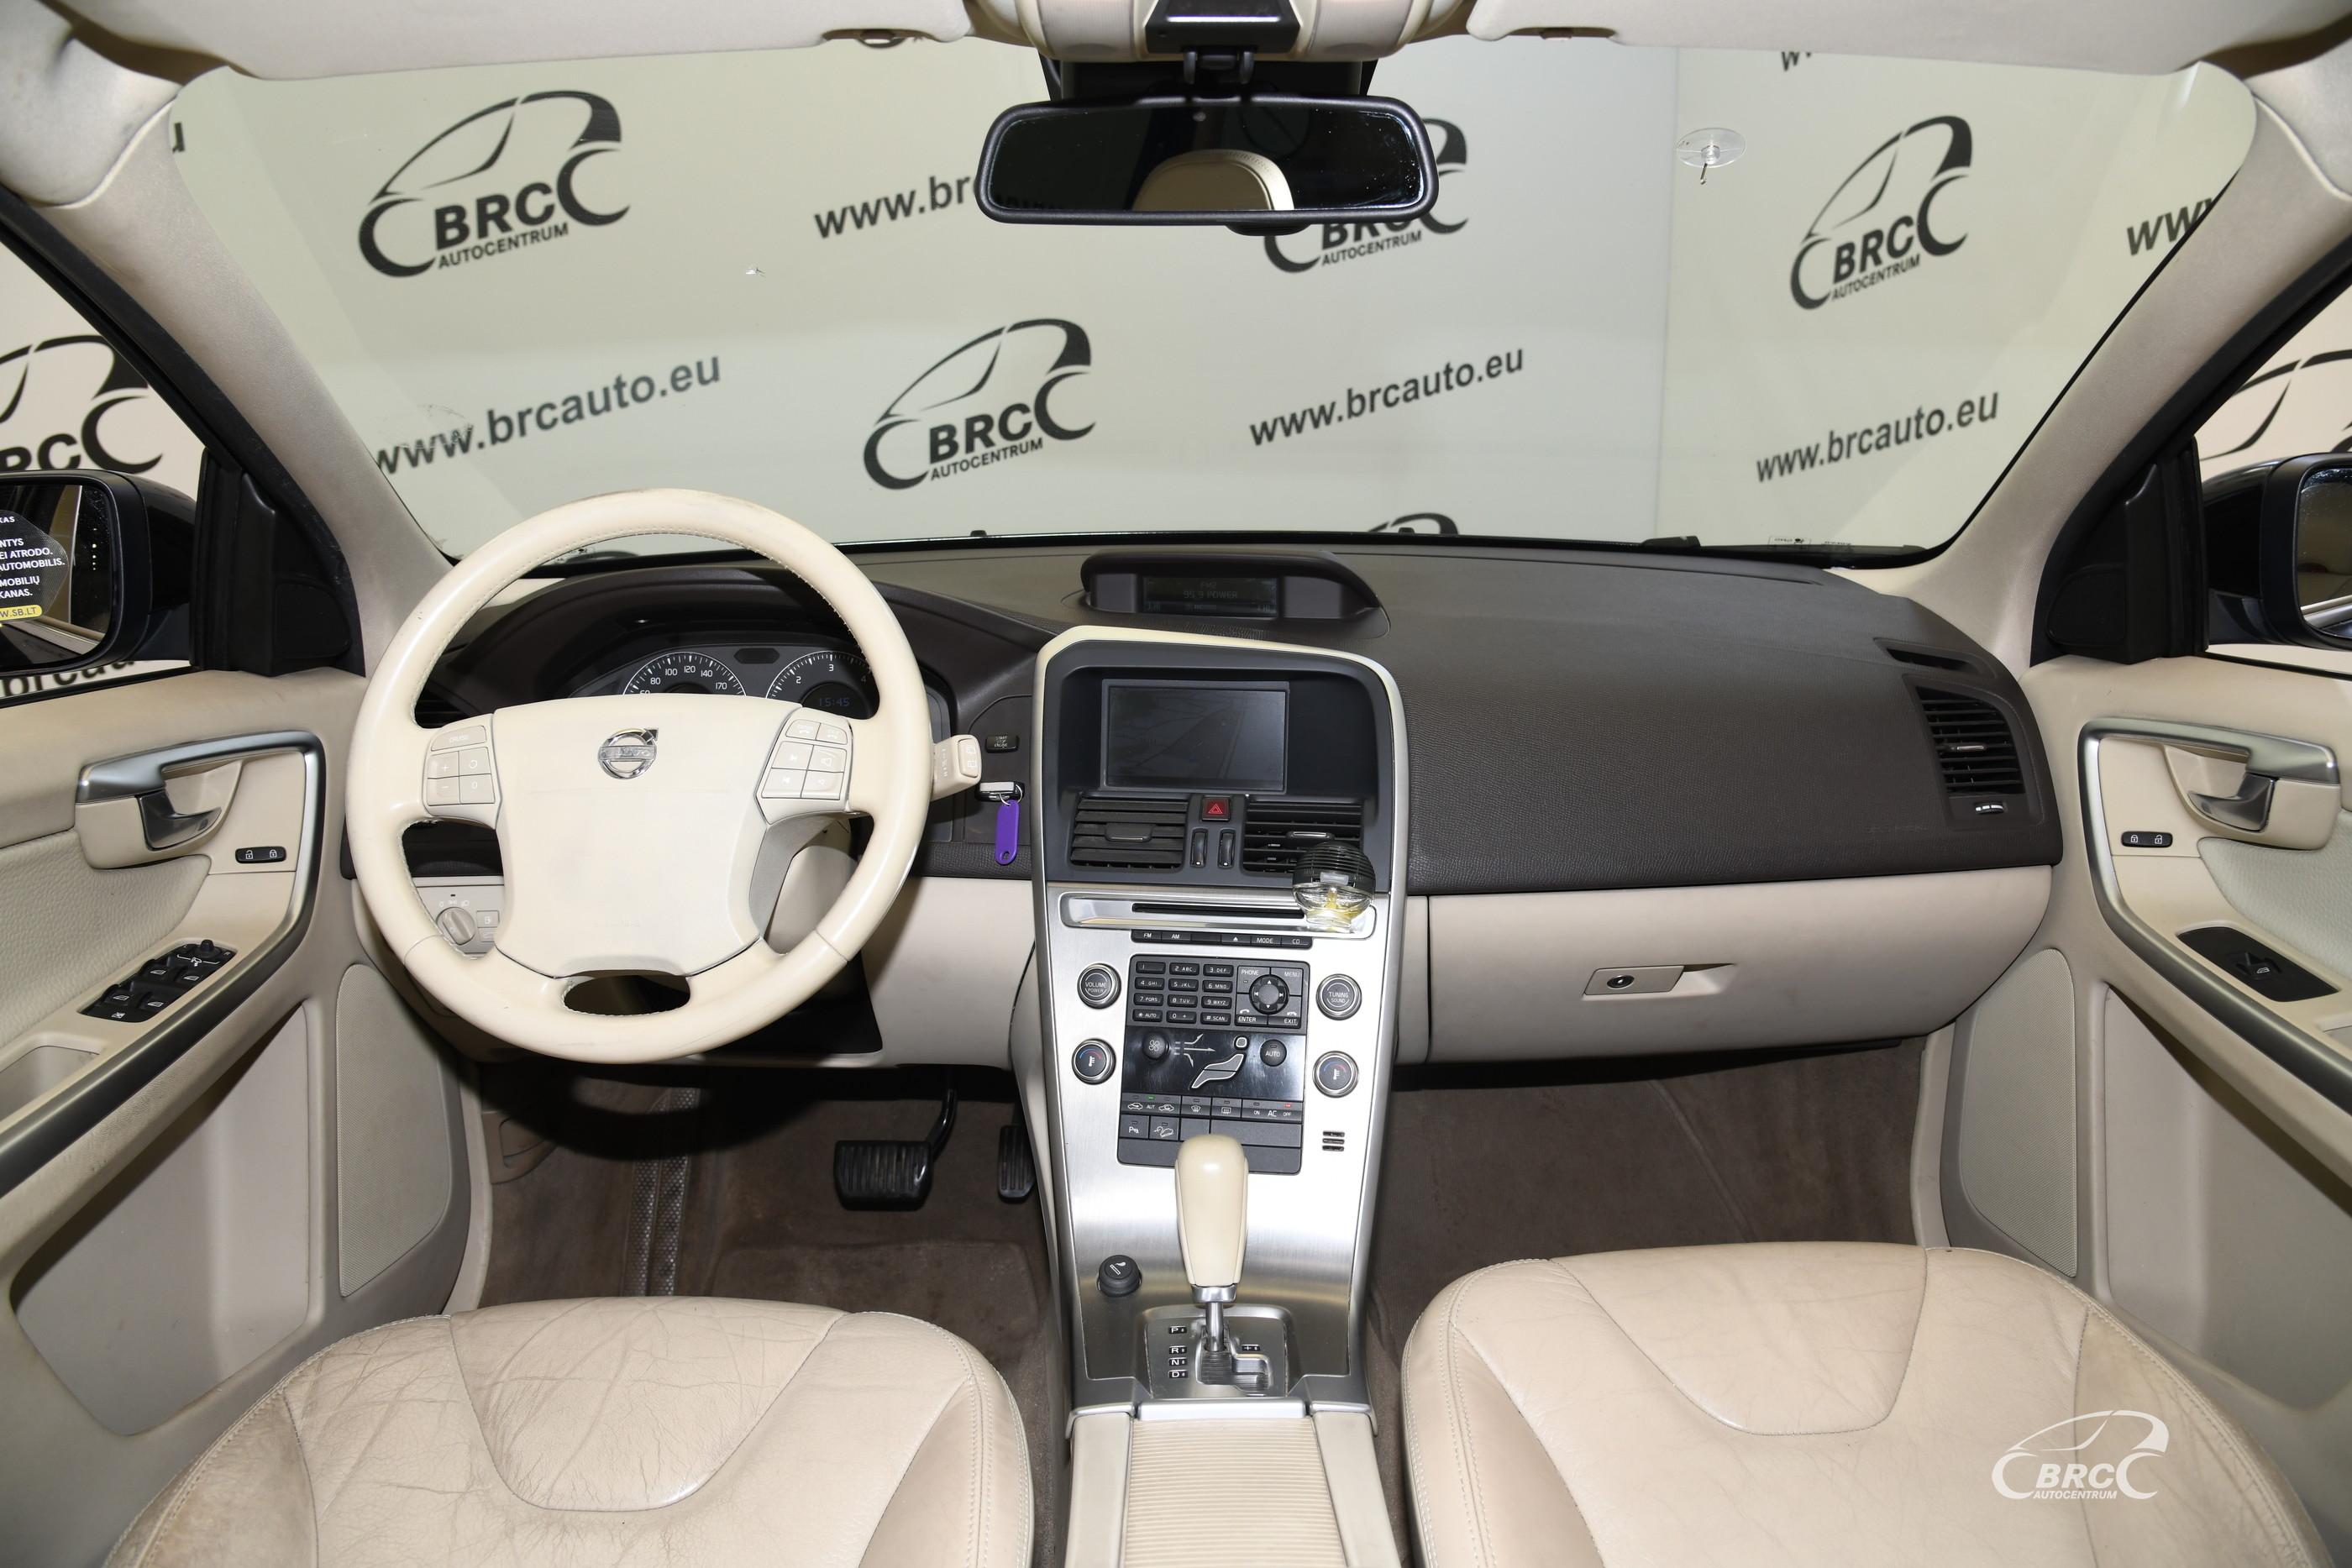 Volvo XC 60 2.4D AWD Automatas